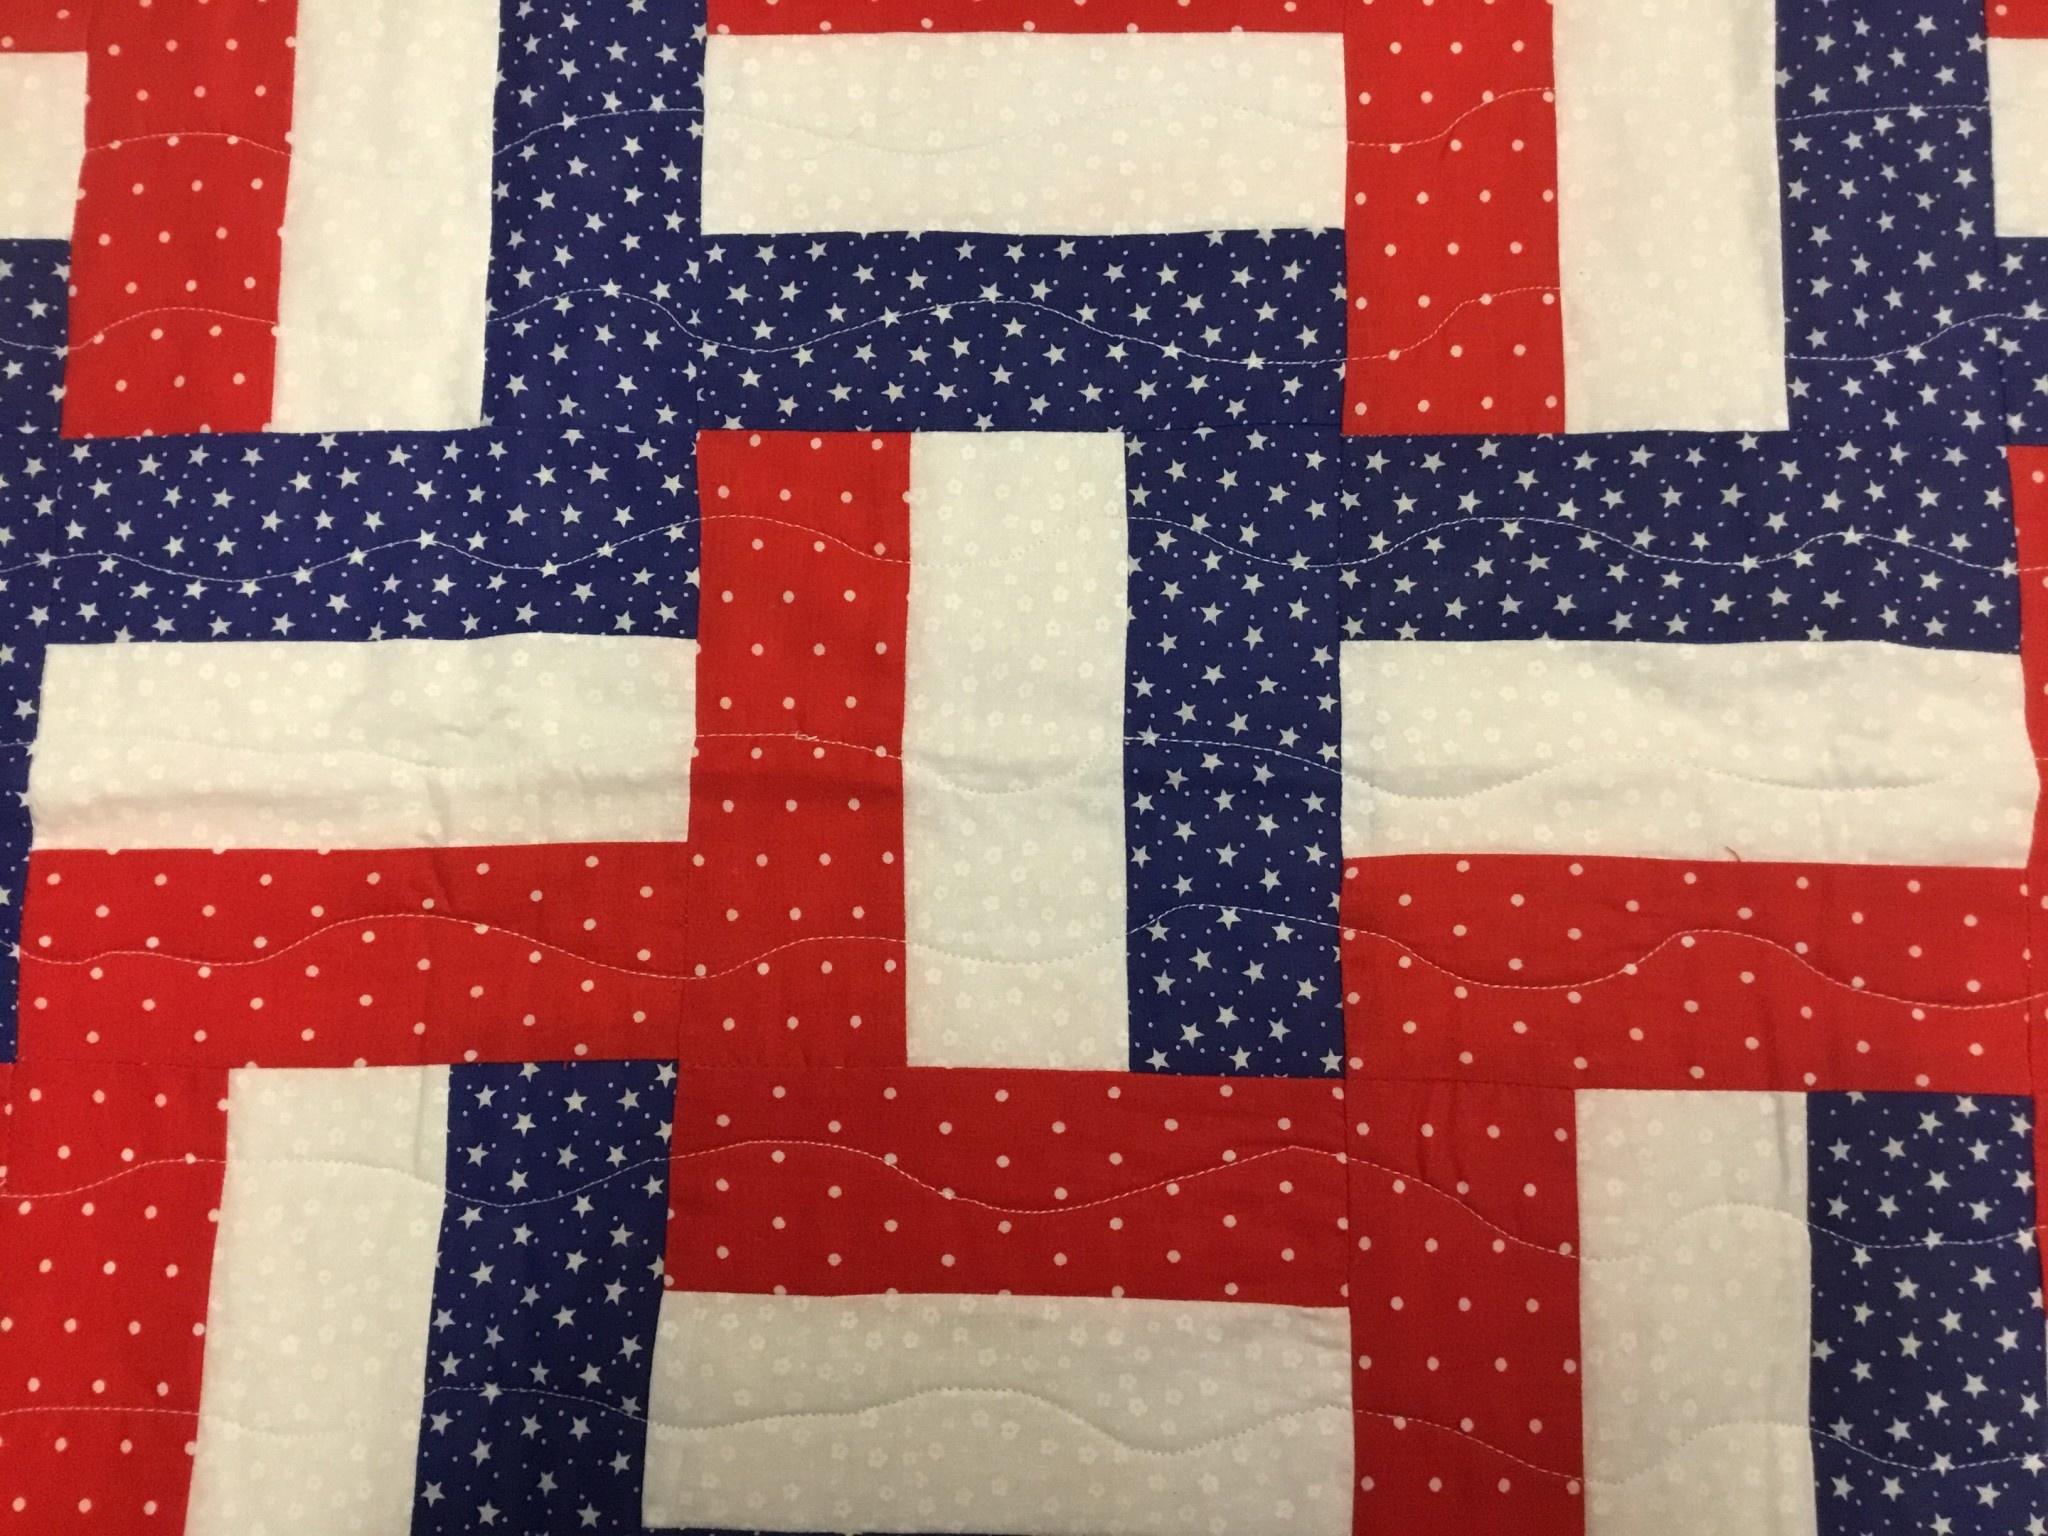 Effie Neff Hand Stitched Patriotic Table Runner